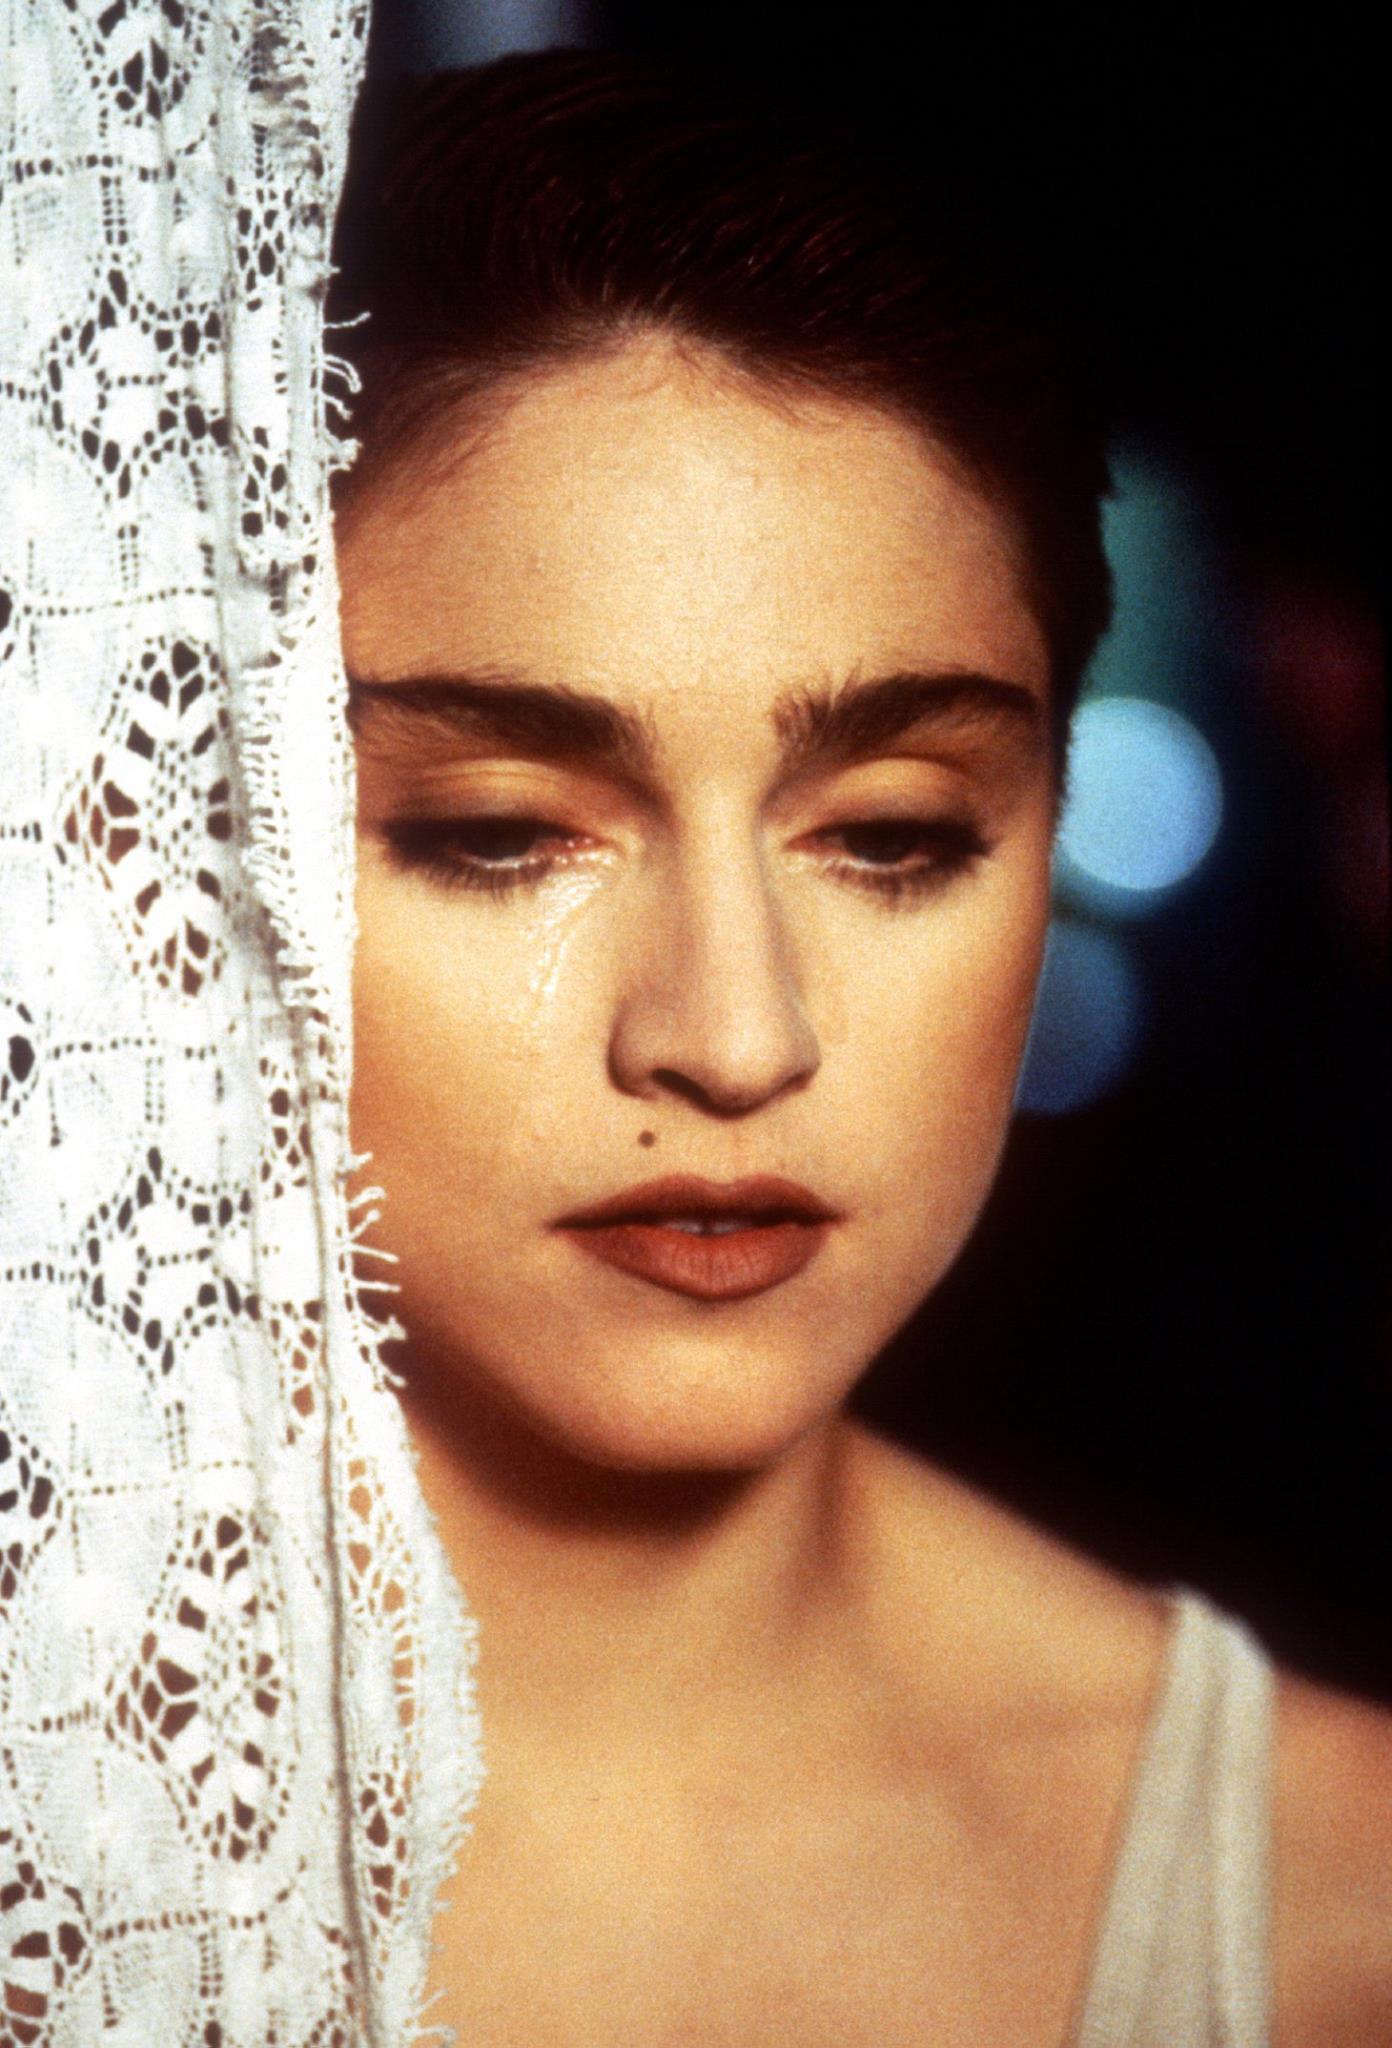 Image Au Madonna Photo Gallery – Emploiaude